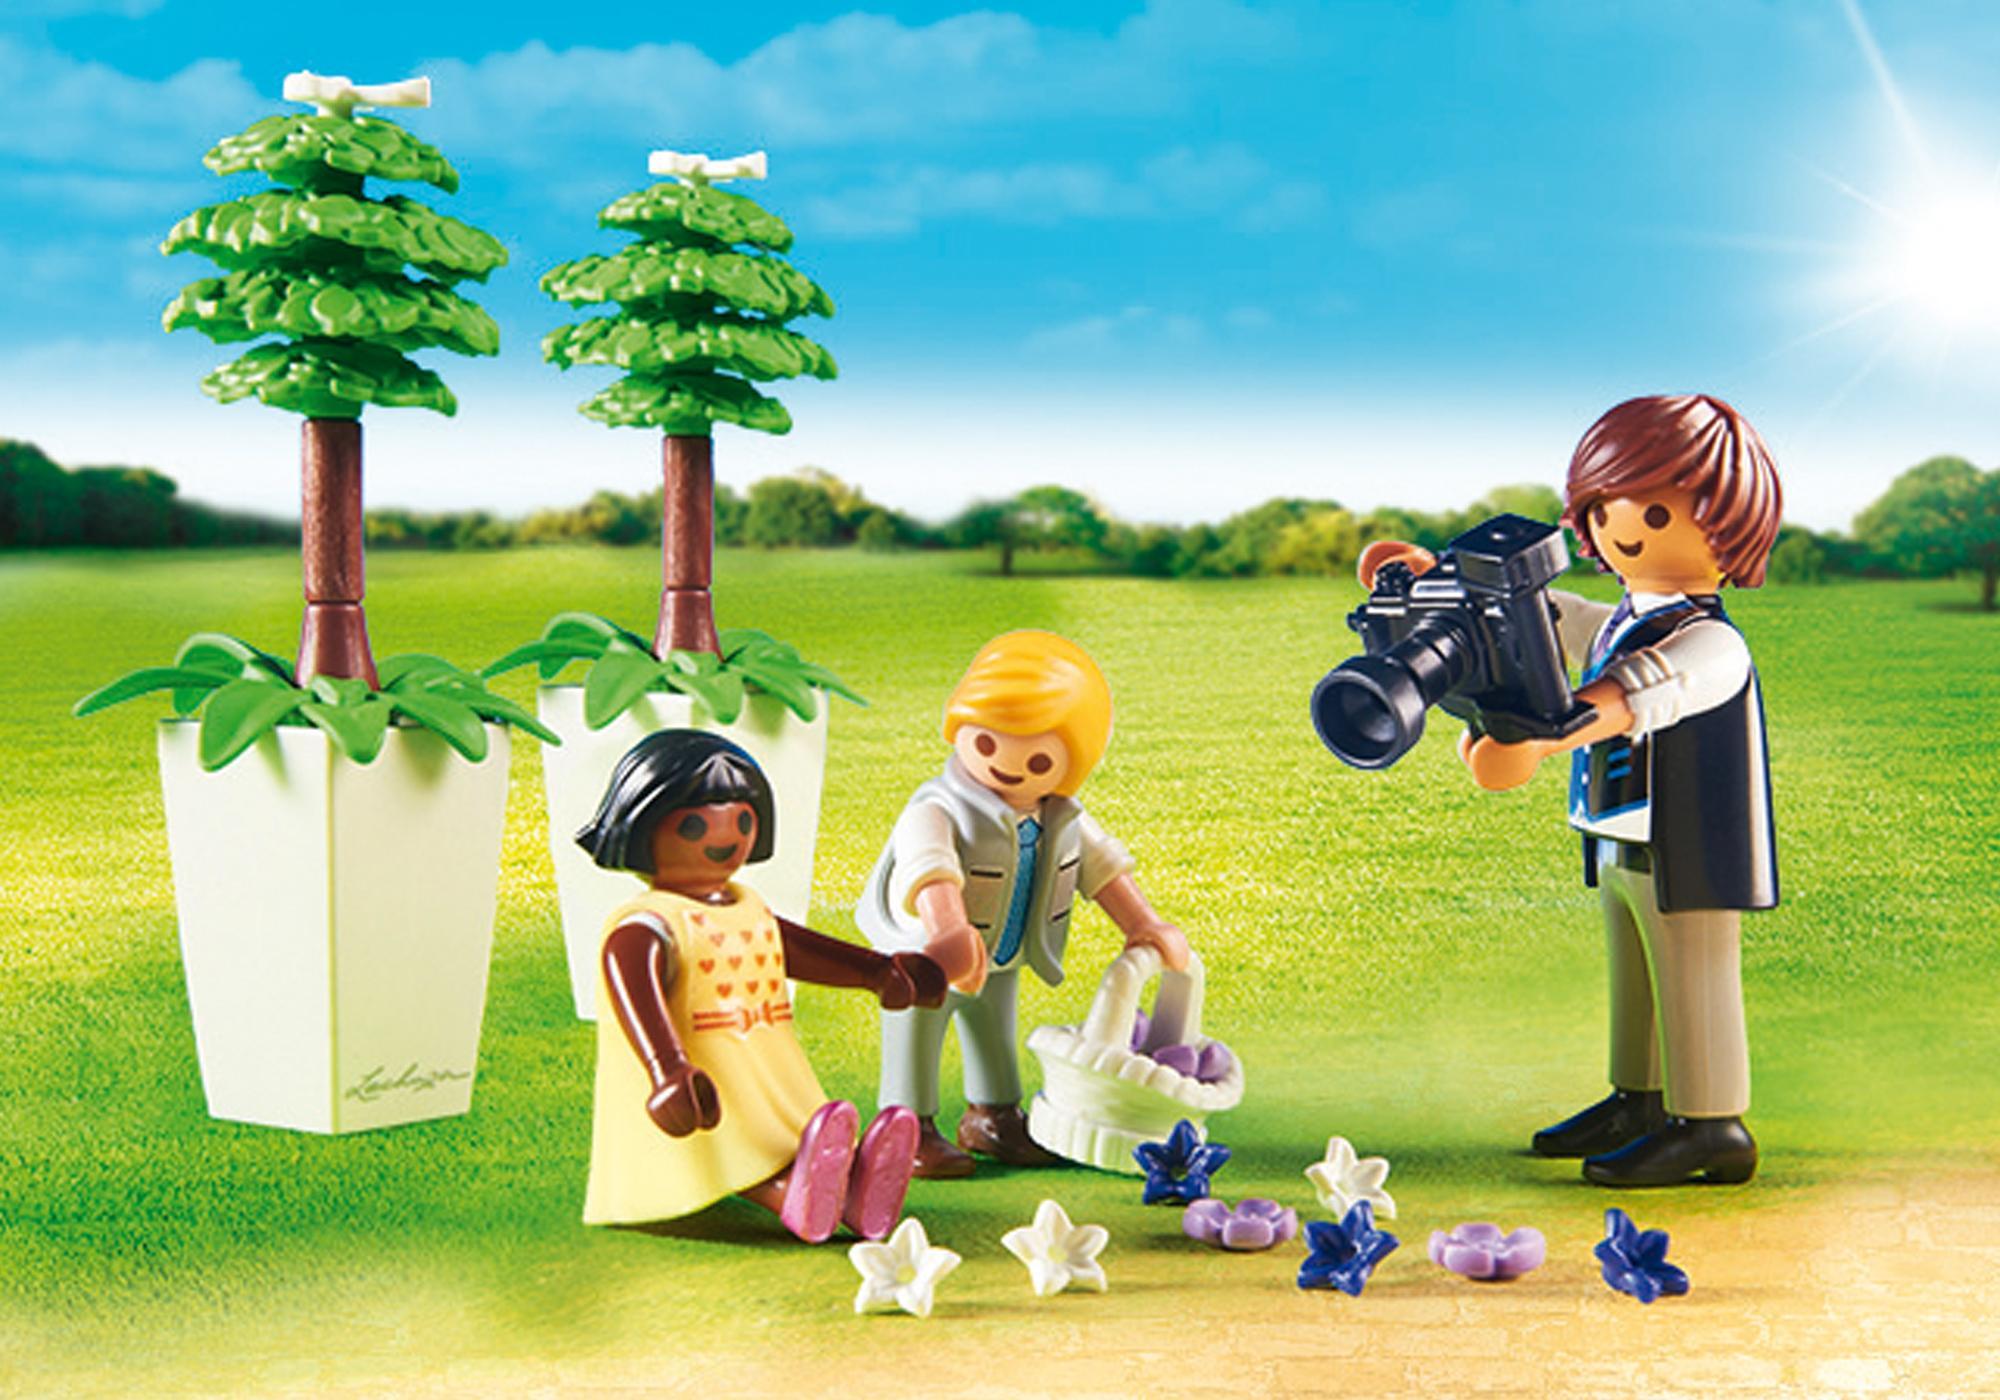 http://media.playmobil.com/i/playmobil/9230_product_extra1/Fotograf mit Blumenkindern